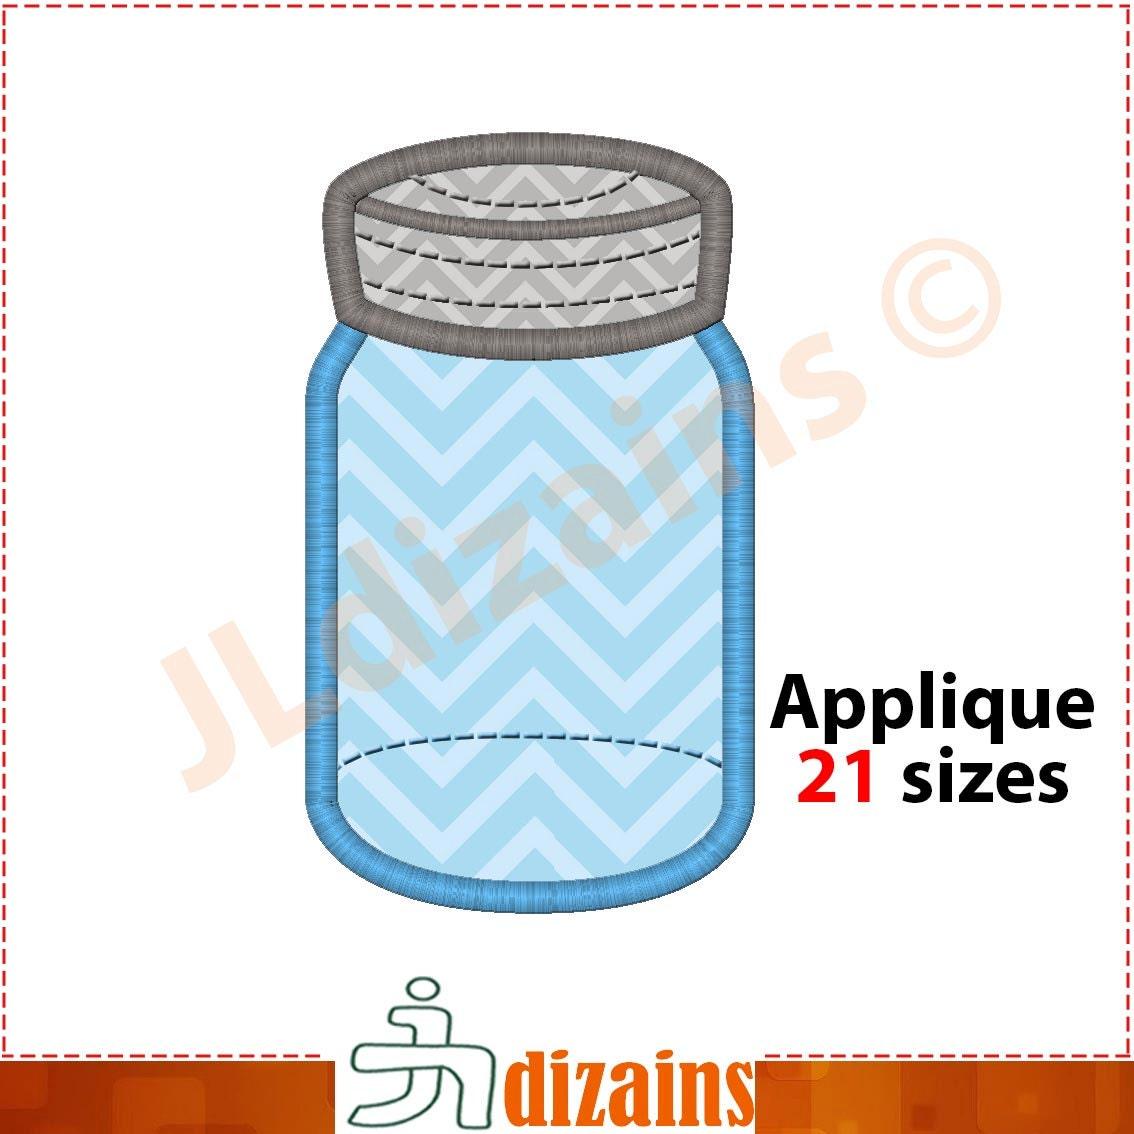 jar machine embroidery design